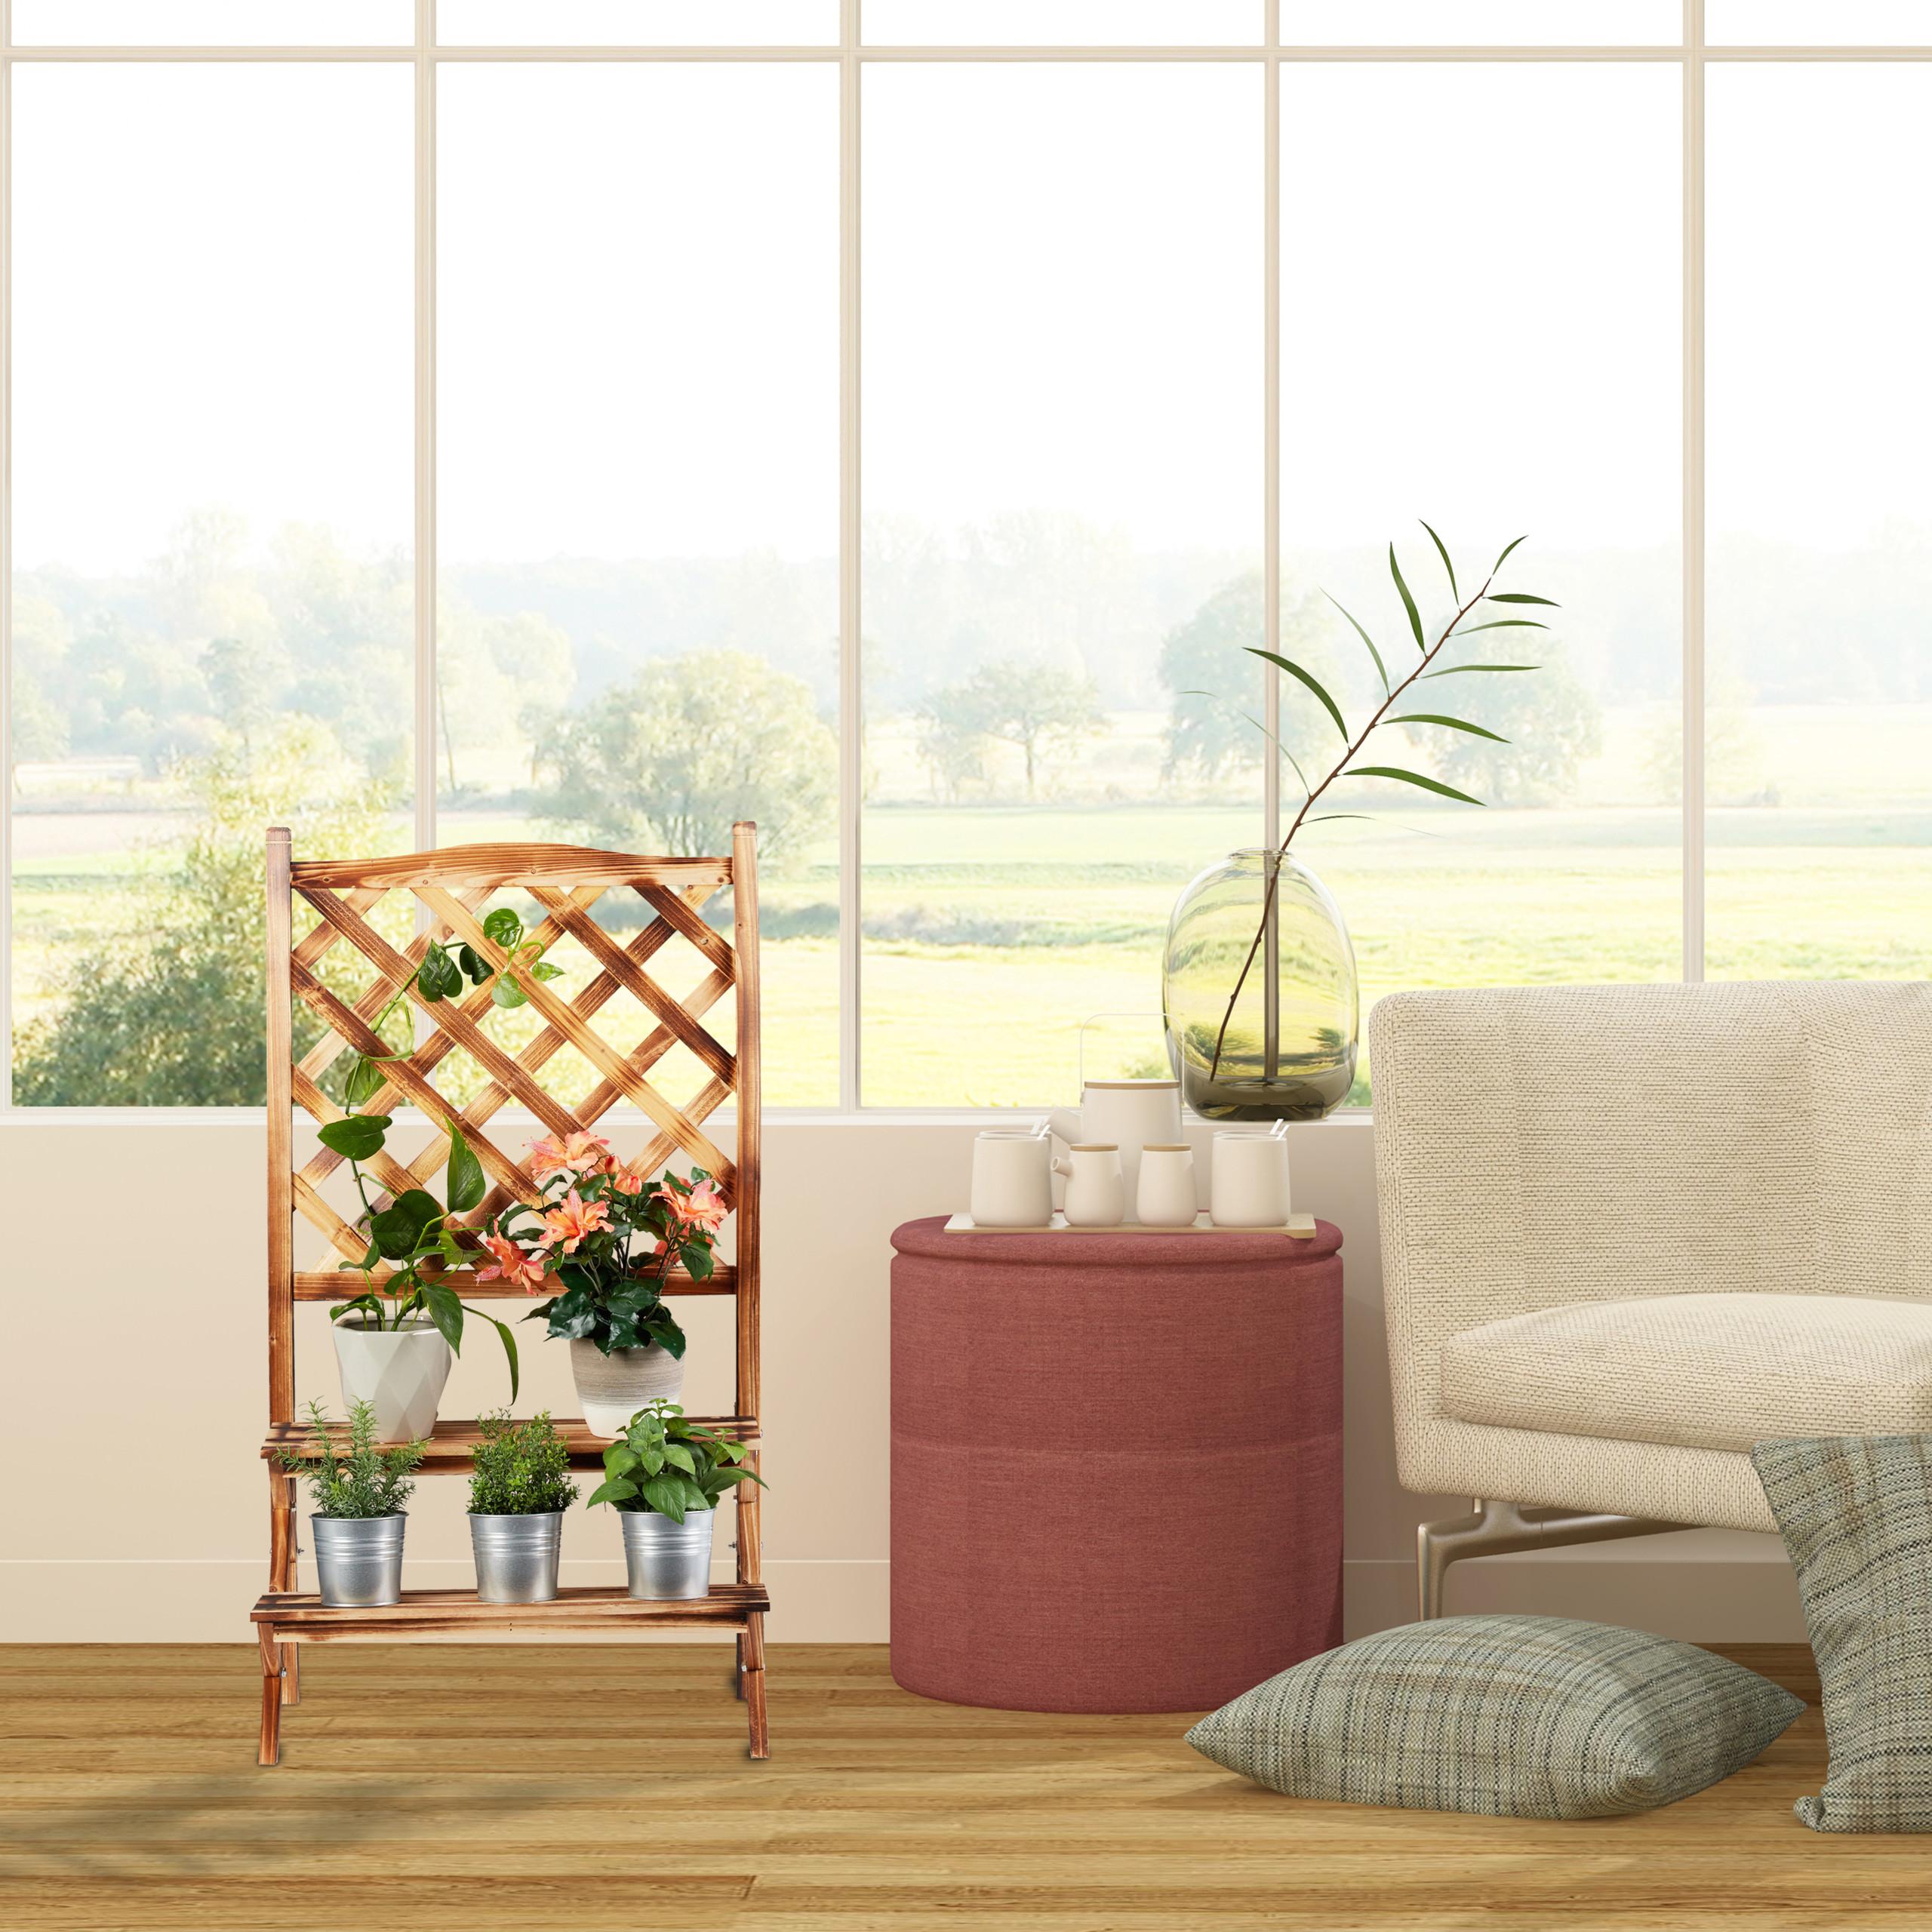 plantenrek-hout-plantentrap-plantenklimrek-bloemenrek-bloementrap miniatuur 3